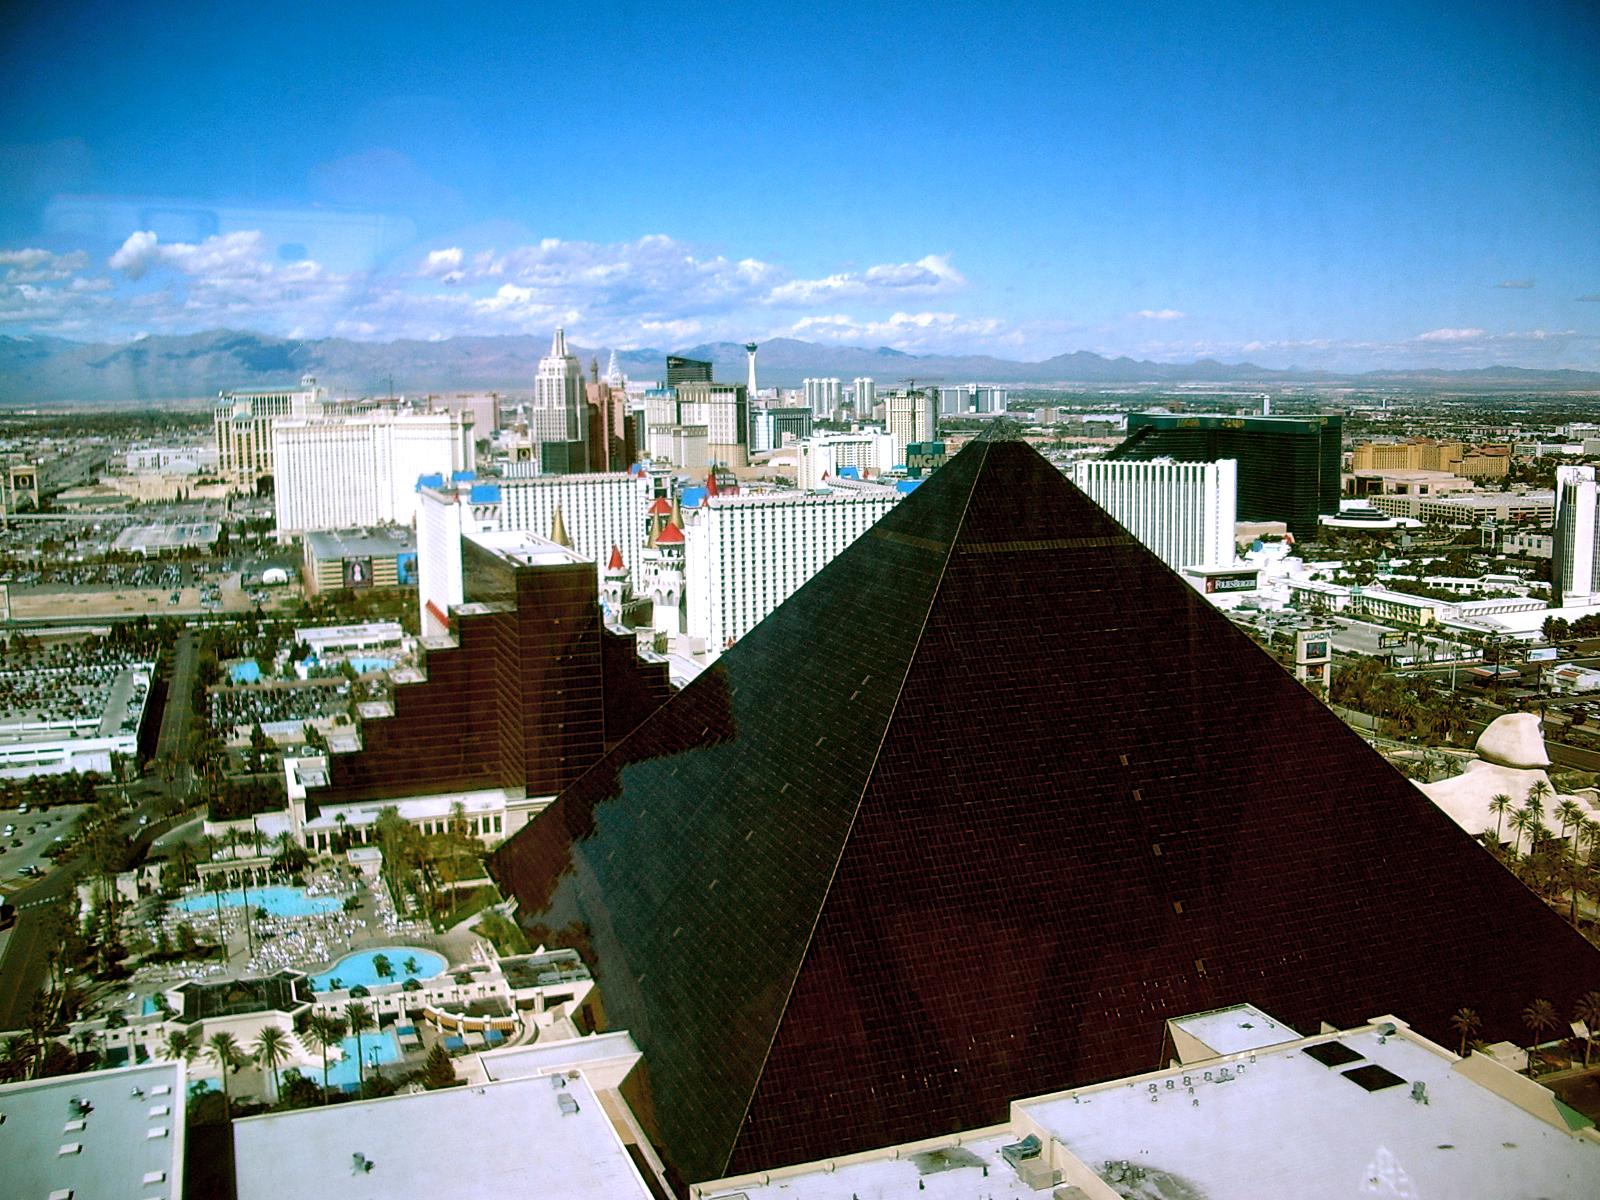 Пирамида (архитектура) - это... Что ...: dic.academic.ru/dic.nsf/ruwiki/297997